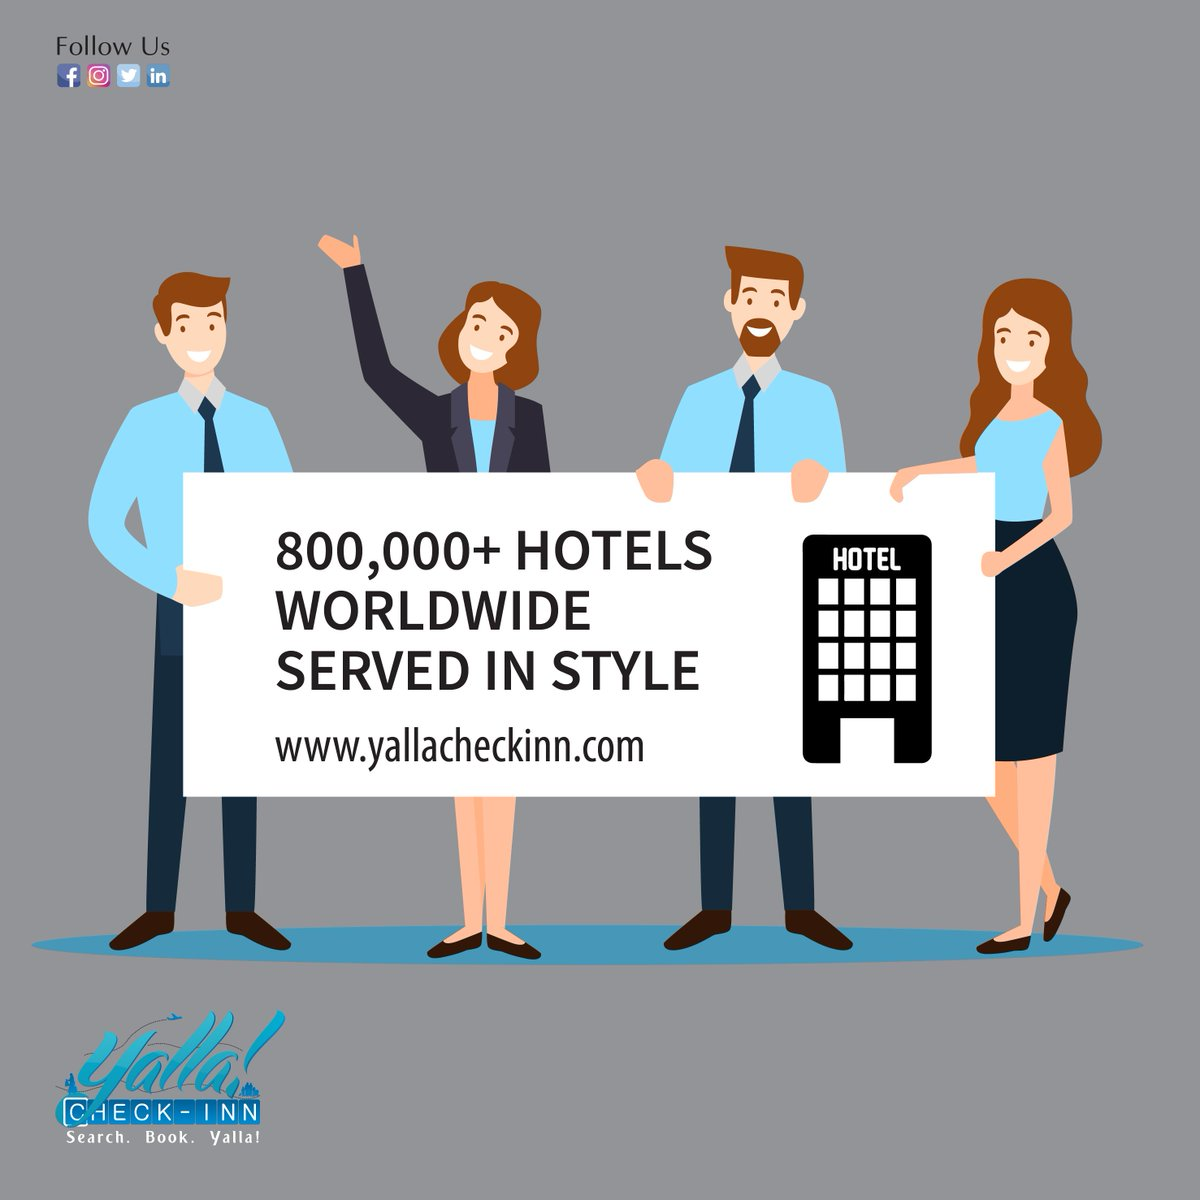 🔍Search over 800,000 #Hotels #Worldwide SEARCH. BOOK. YALLA!  https://t.co/baScaL4E94 https://t.co/siAzGVEKtJ